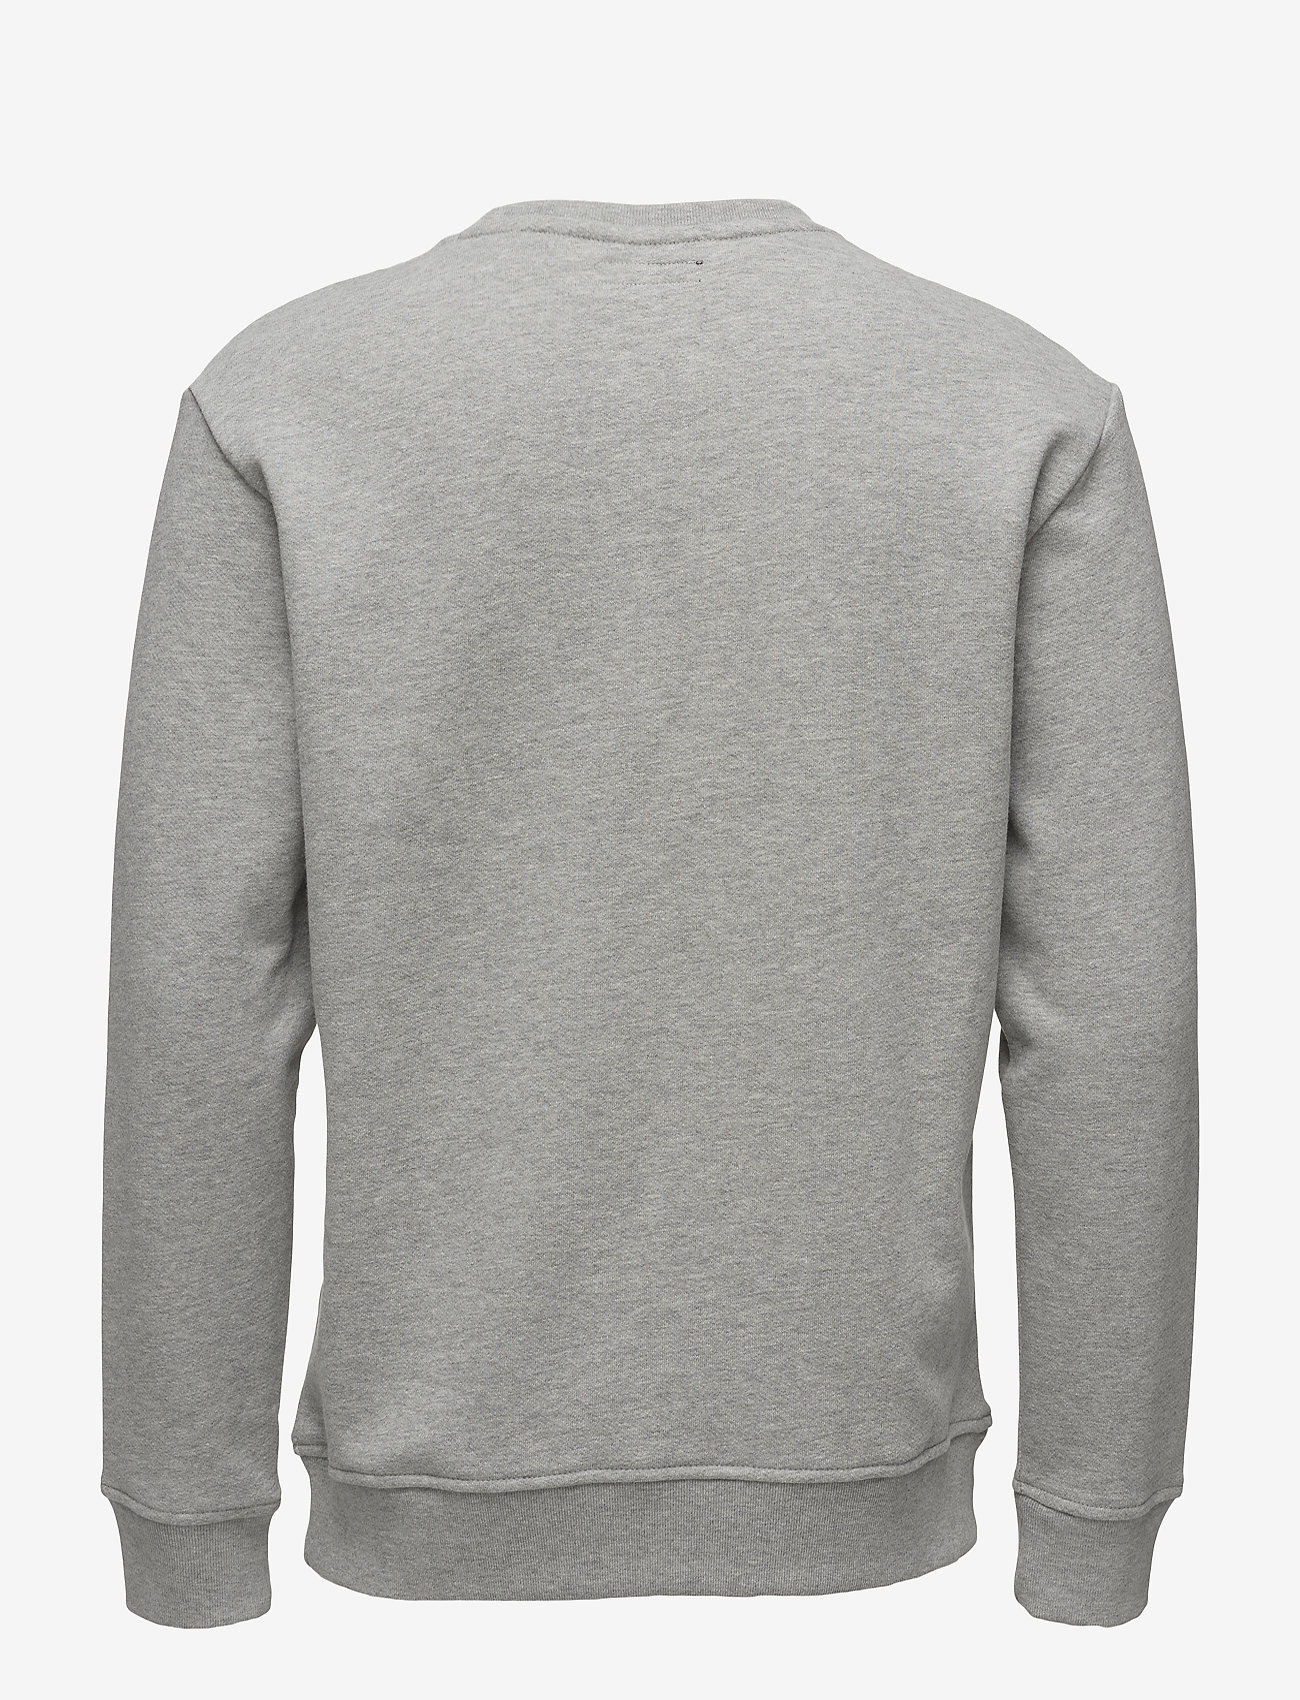 Lee Jeans Logo Sws - Sweatshirts Grey Mele